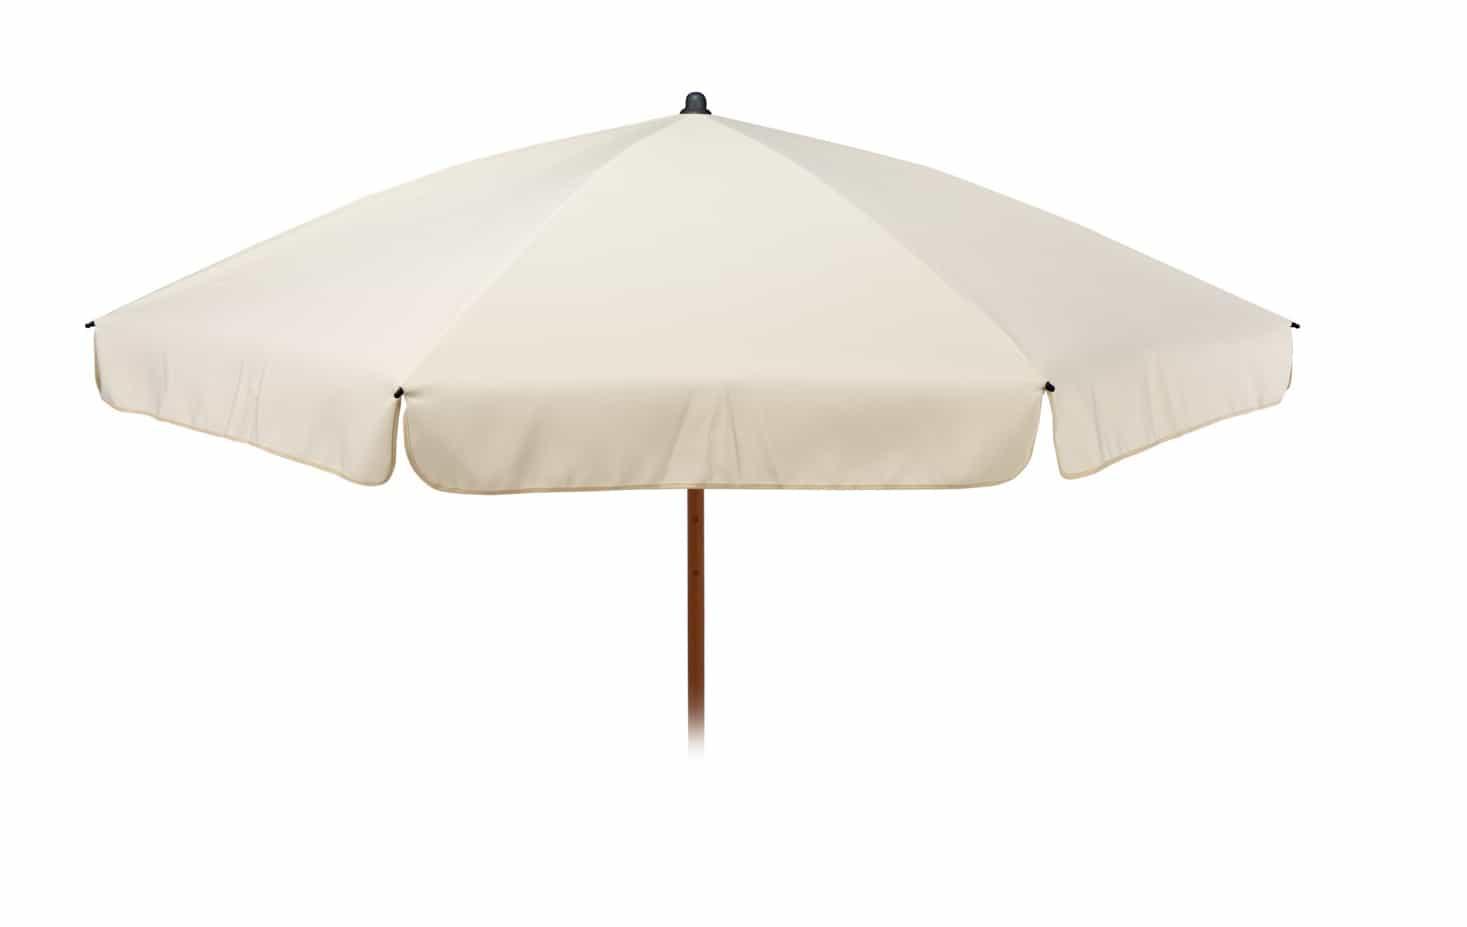 4Goodz Parasol 220 cm met Houtlook buis - Ecru